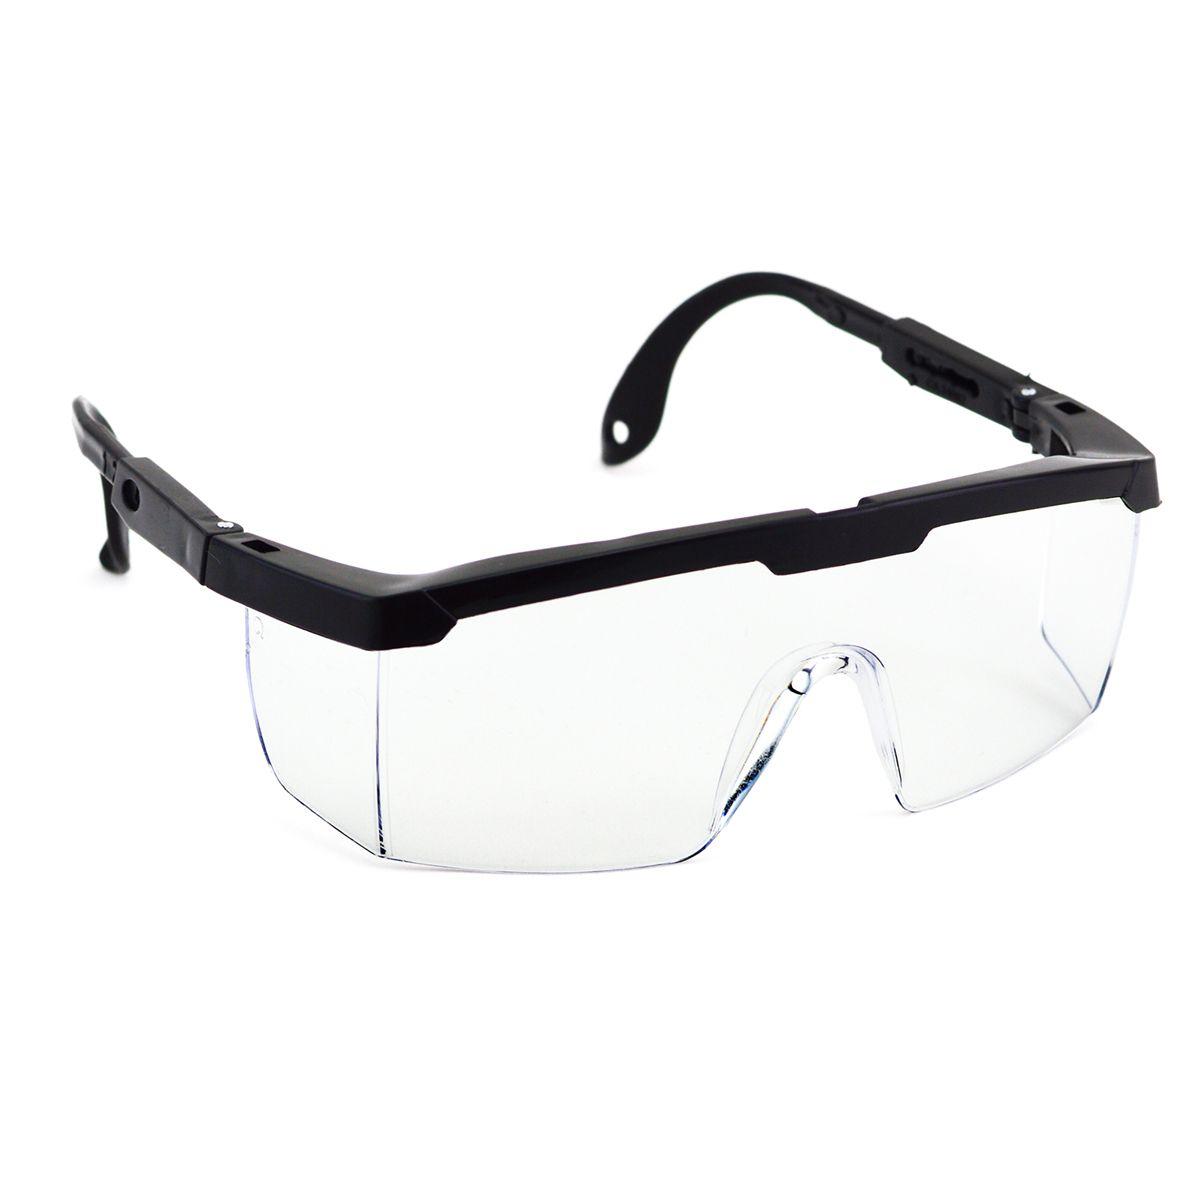 Óculos Poli-Ferr Similar Jaguar CA 33754